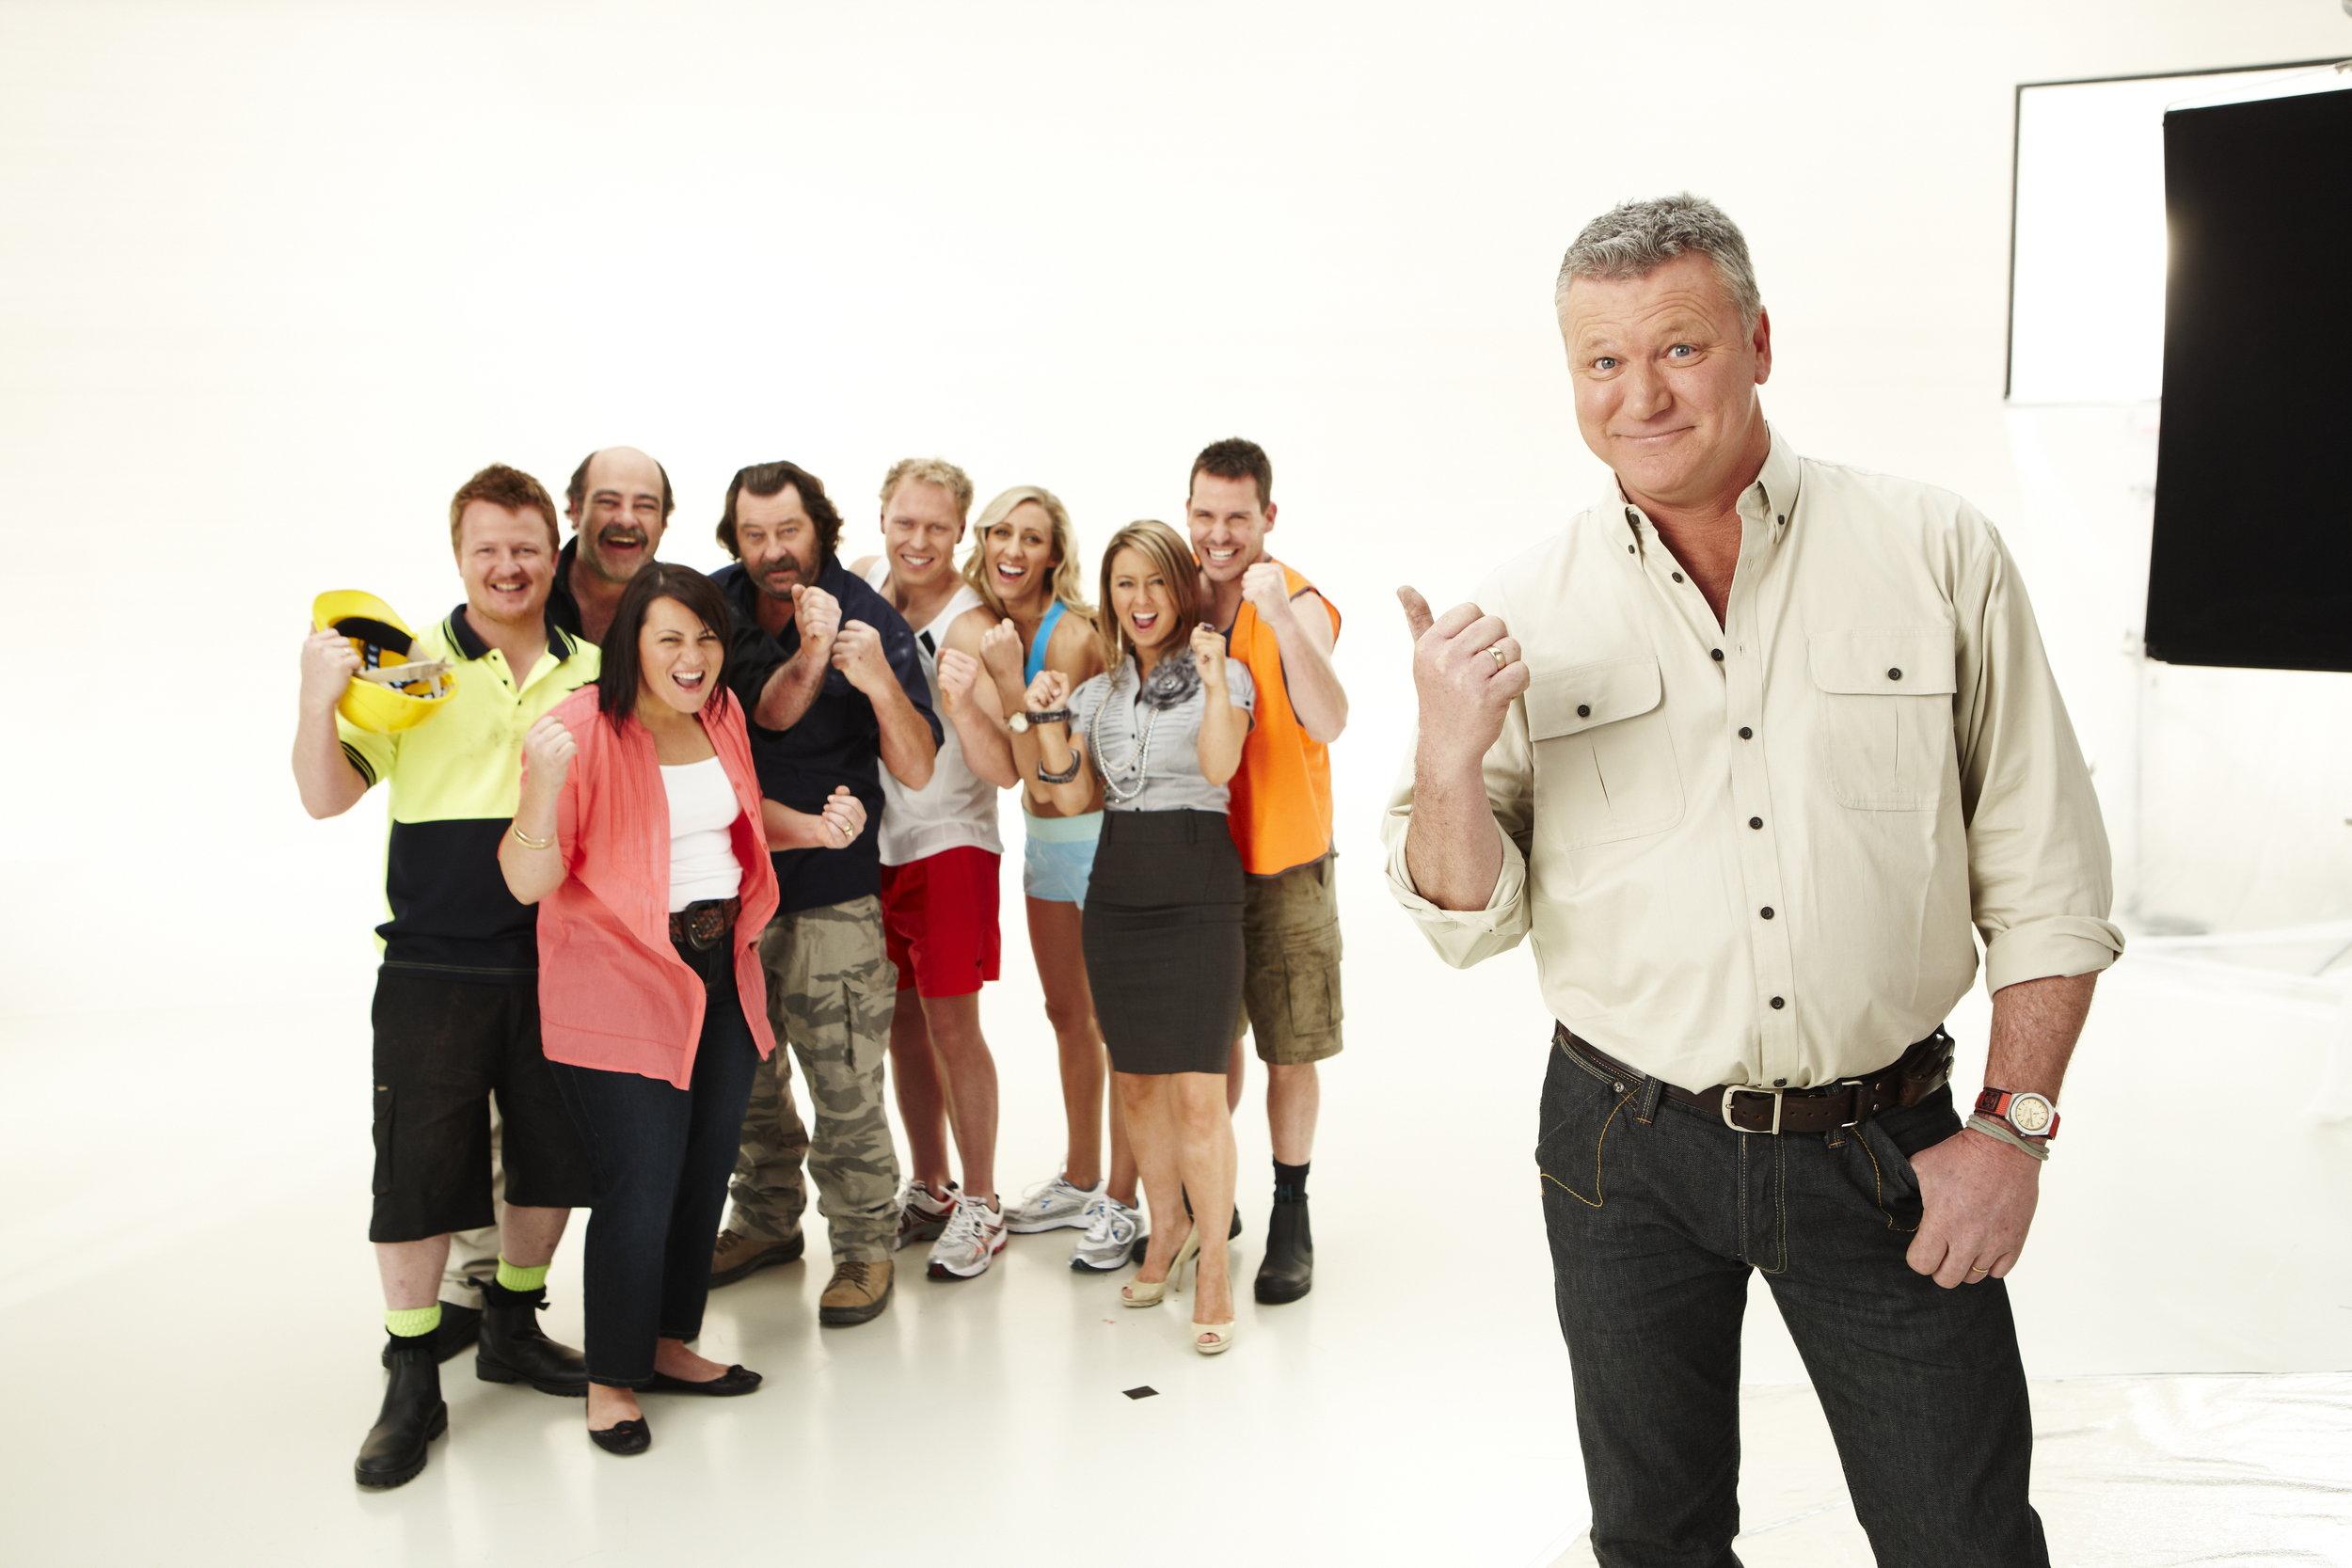 The Block 2010 - Scott Cam with Contestants (1).jpg